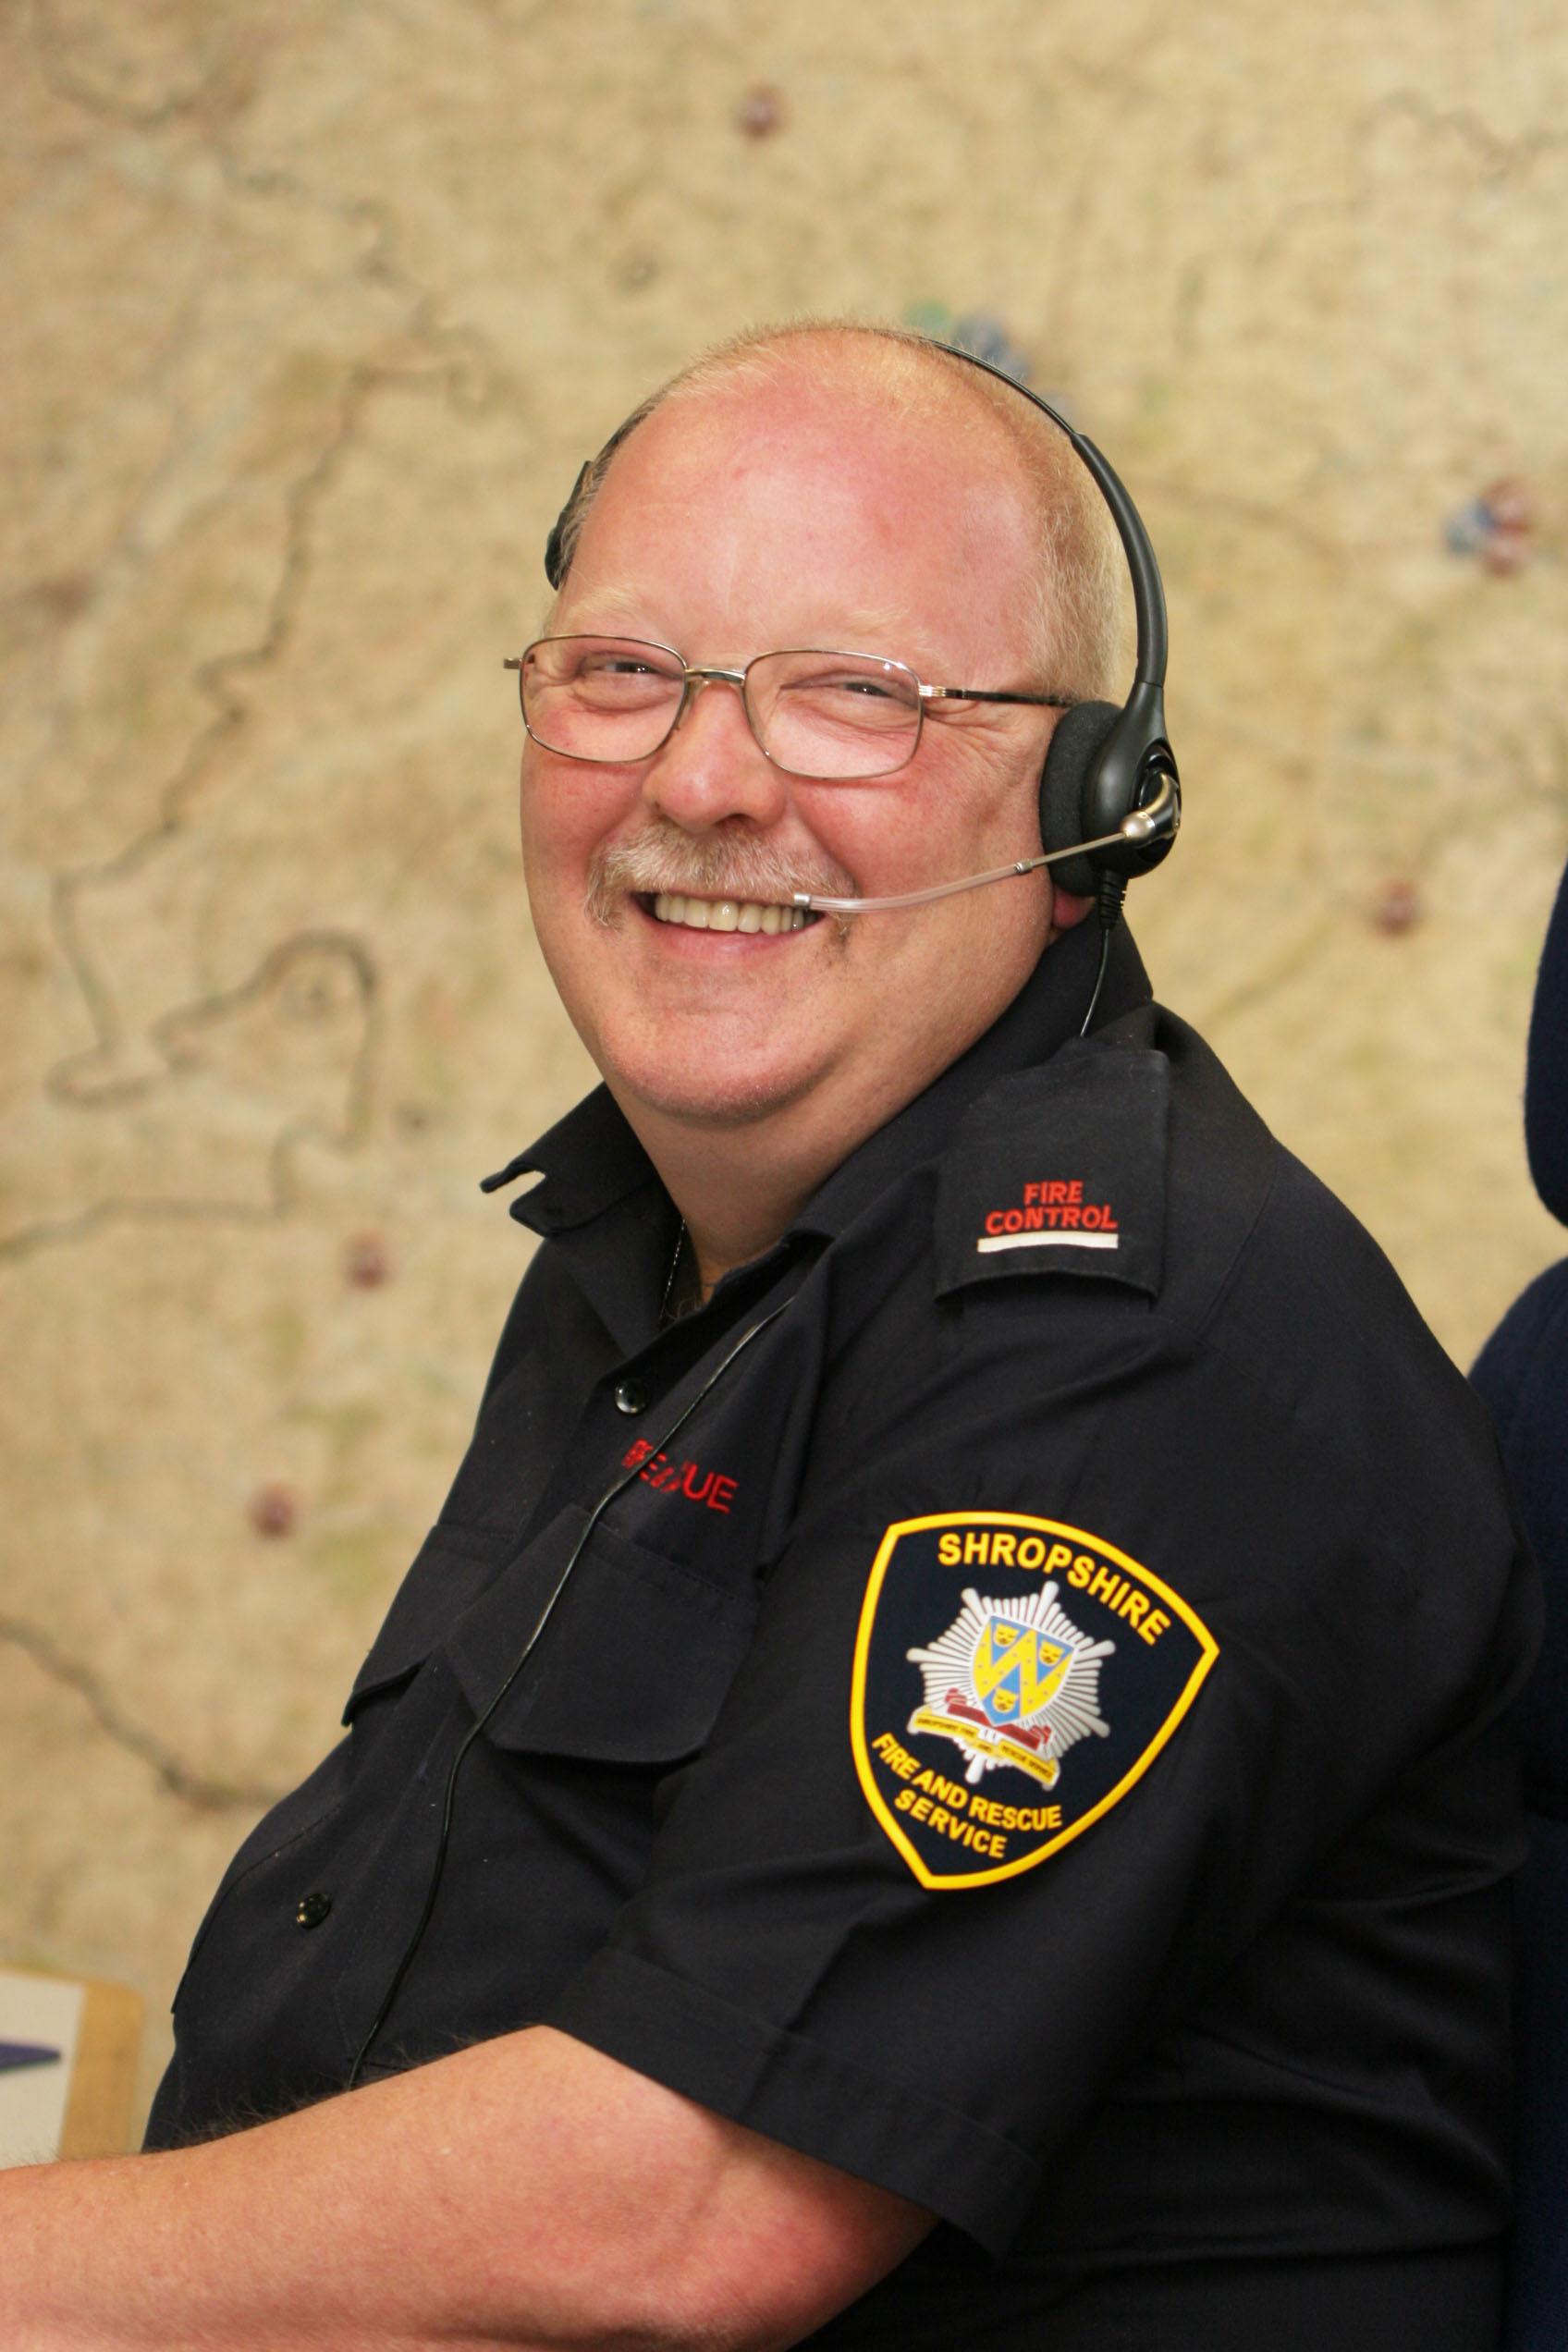 Ian Titley in fire control at Shrewsbury